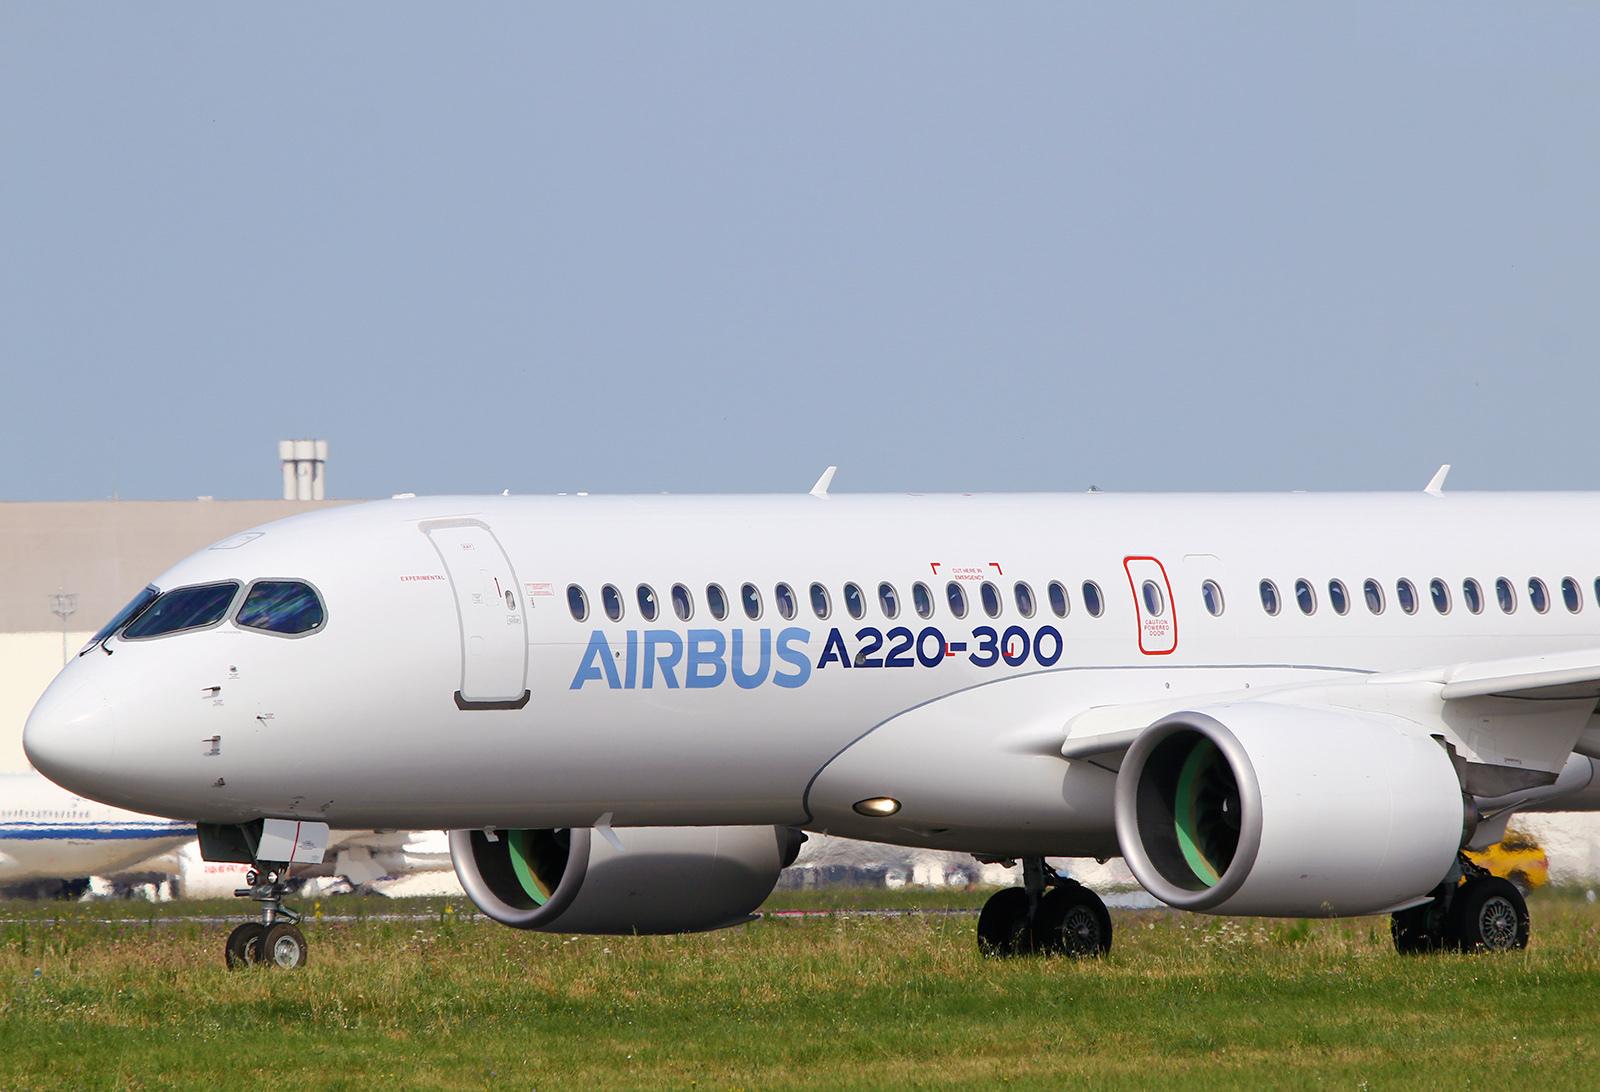 A220-300 Airbus